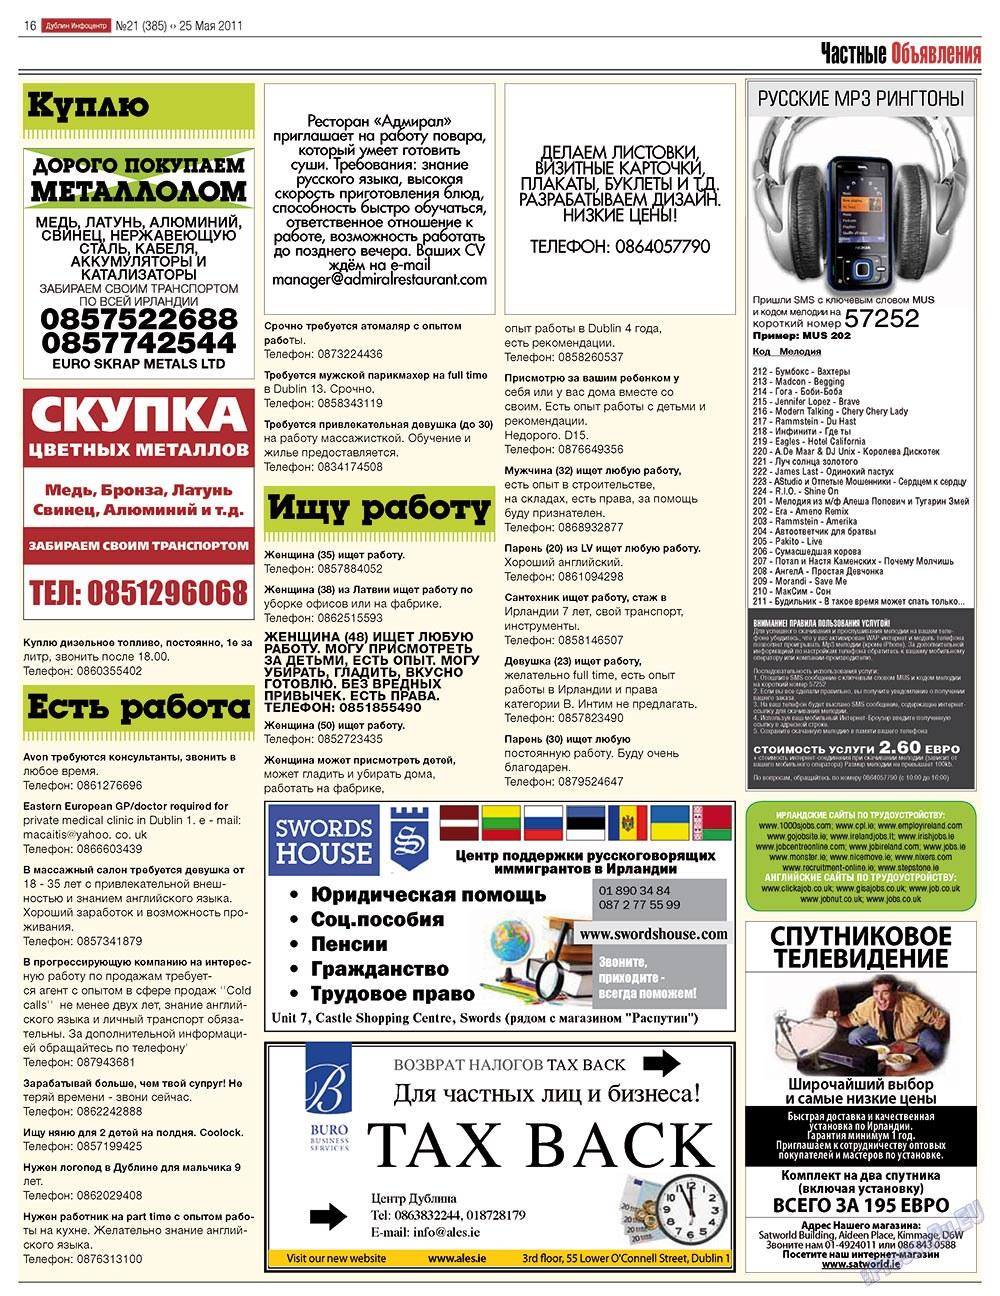 Дублин инфоцентр (газета). 2011 год, номер 21, стр. 16